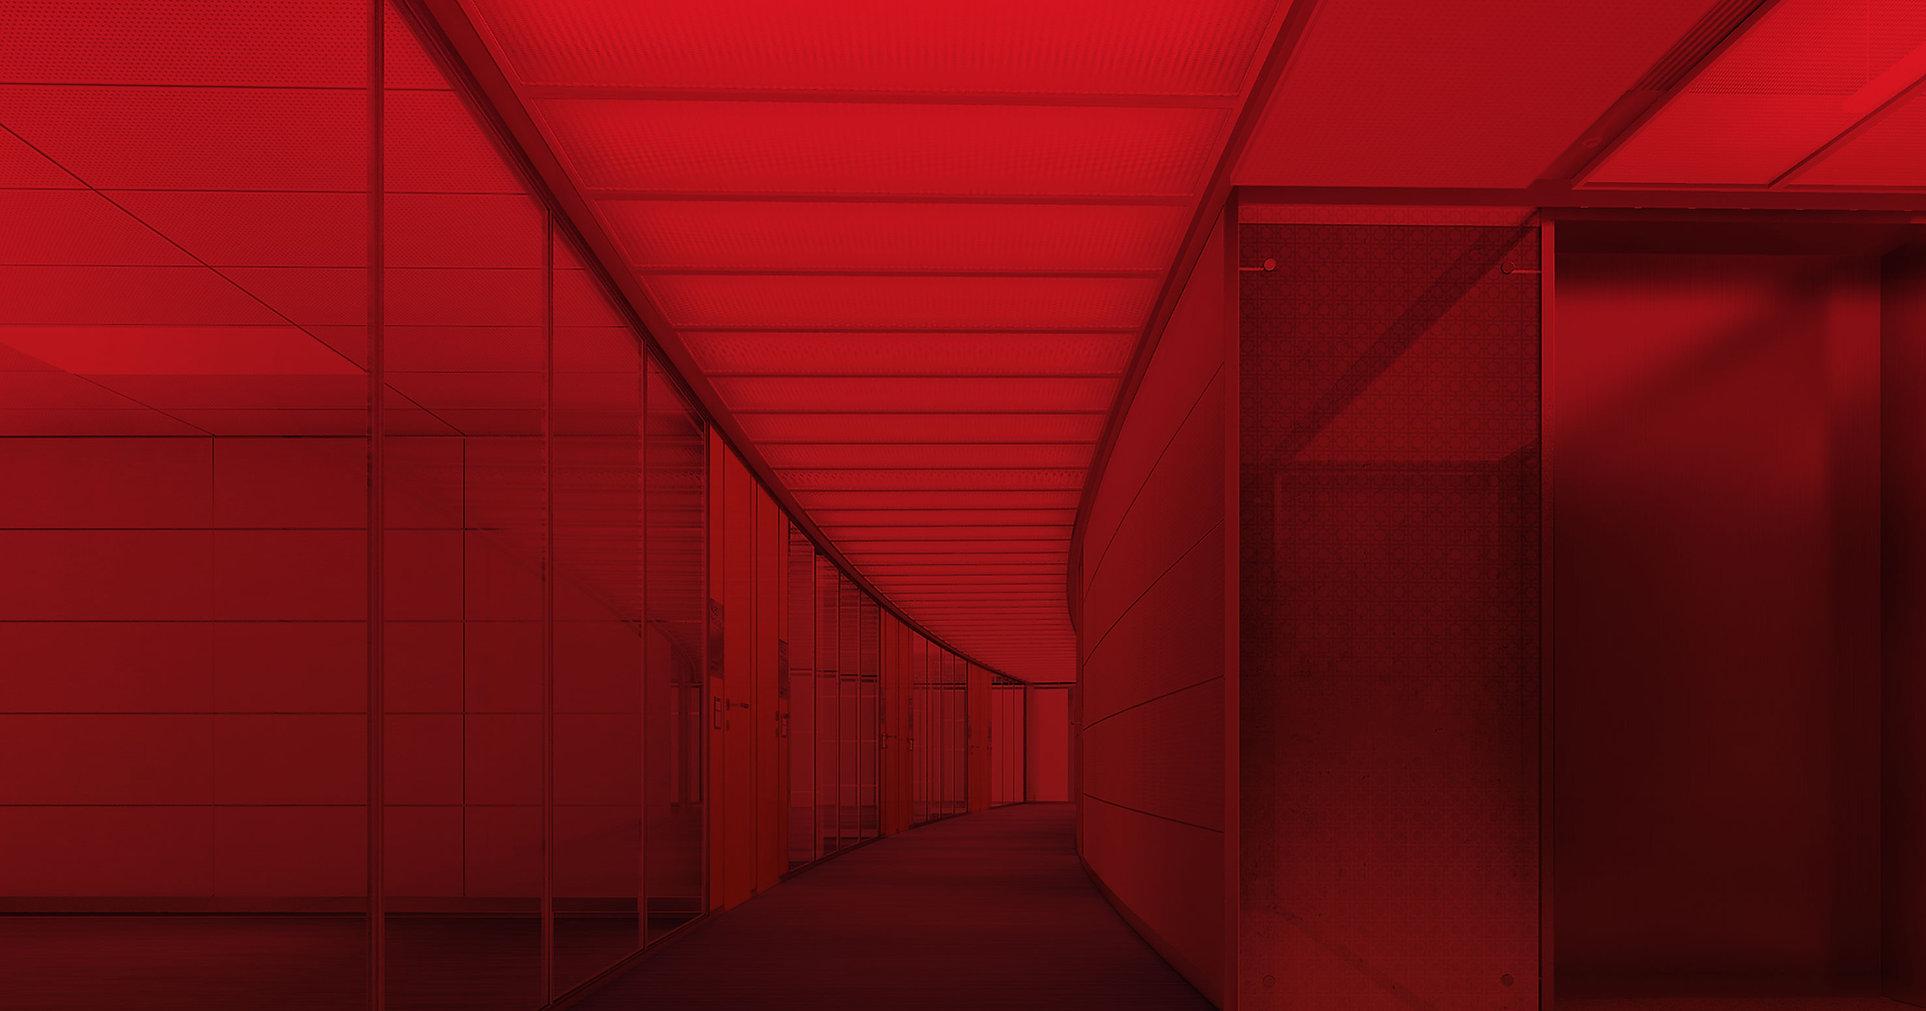 BACKGROUND-RED-nadim.jpg